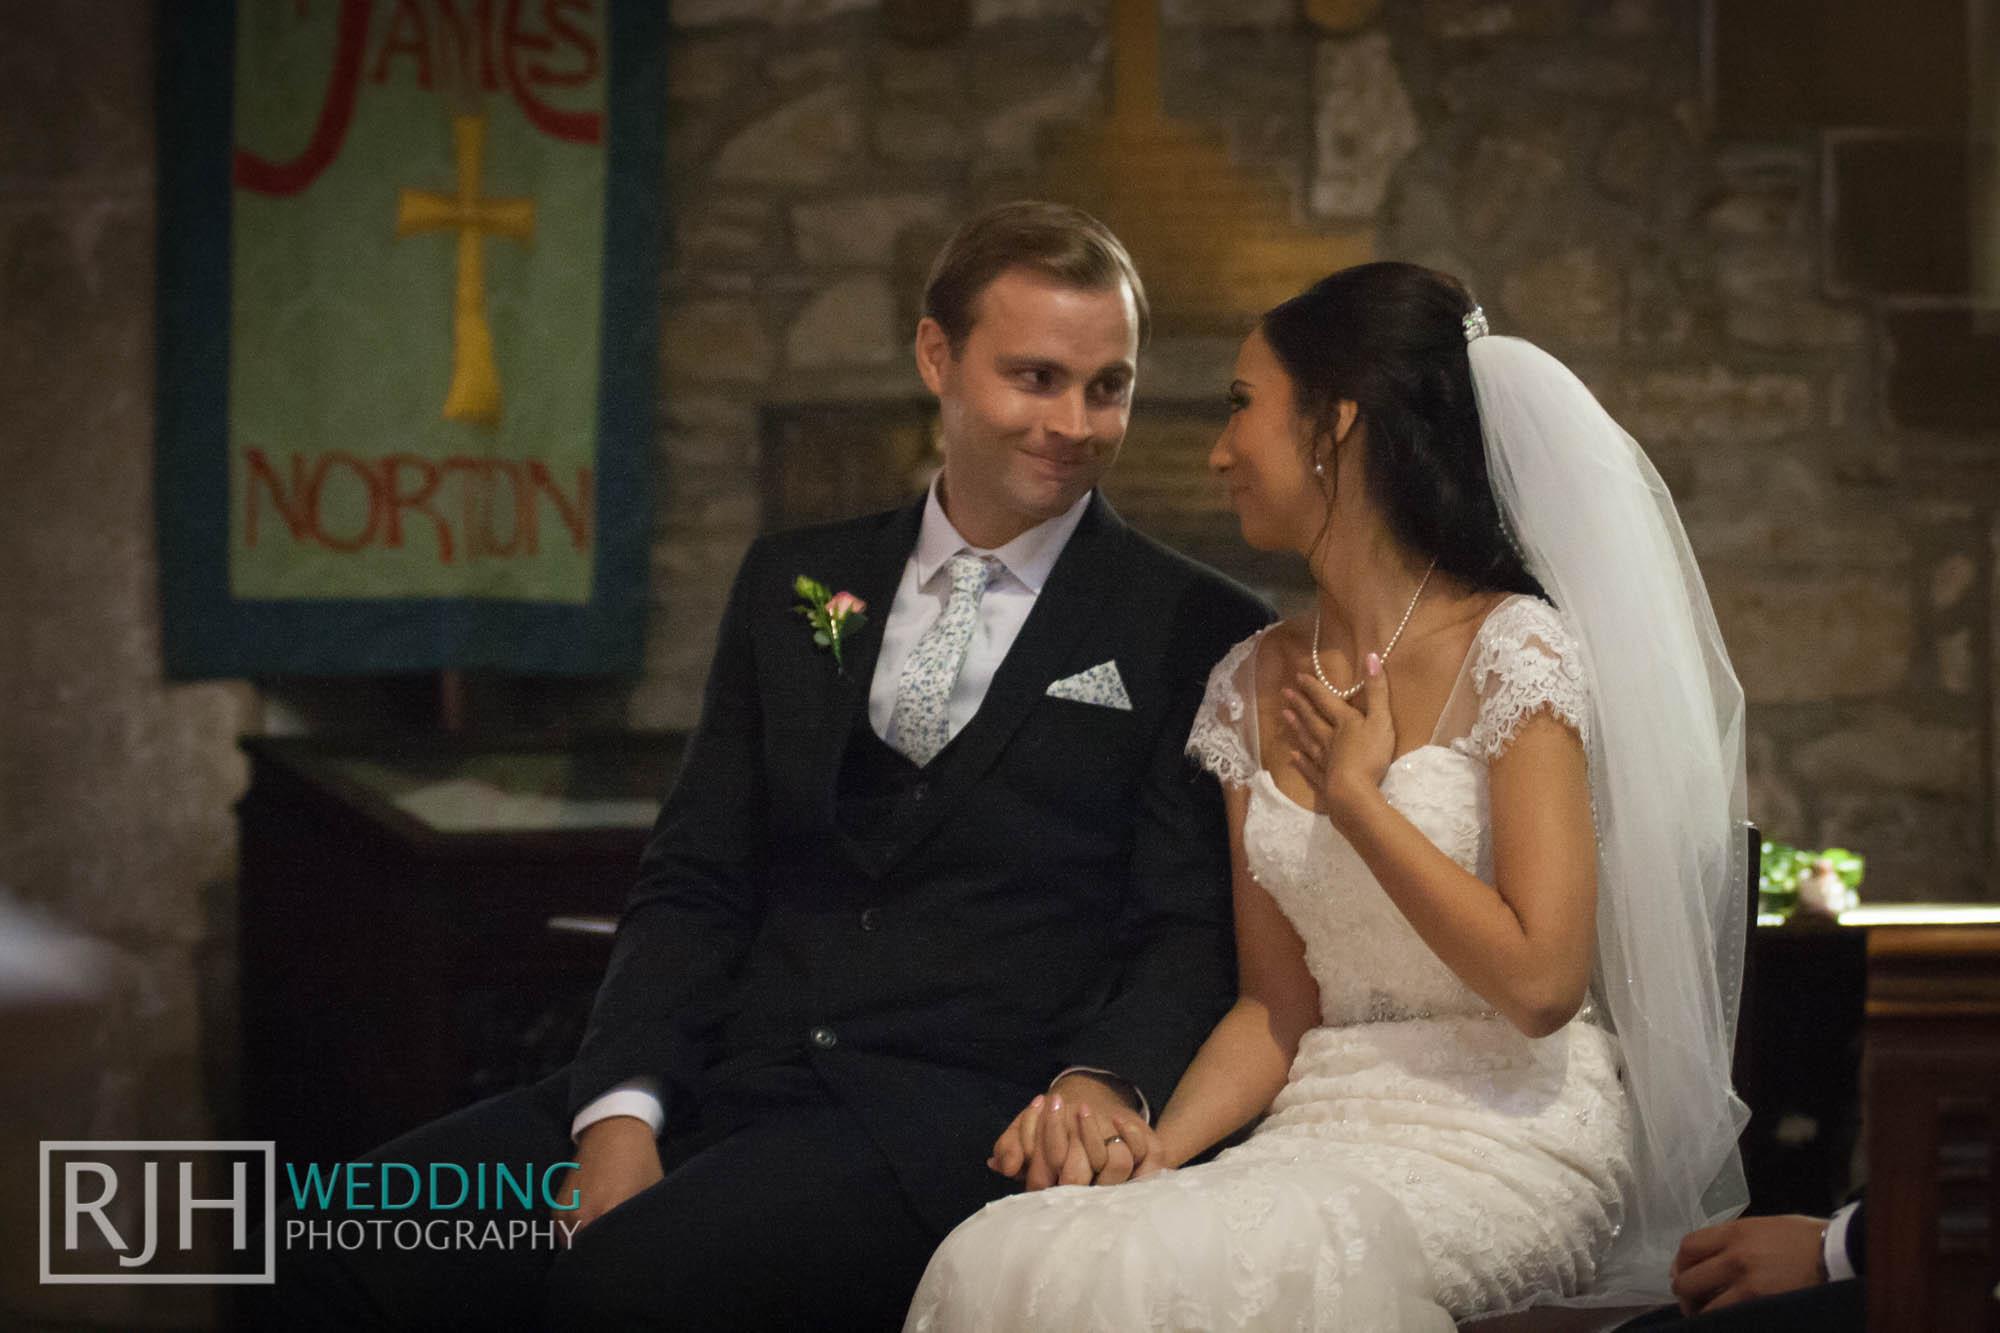 RJH Wedding Photography_Tankersley Manor Wedding_23.jpg